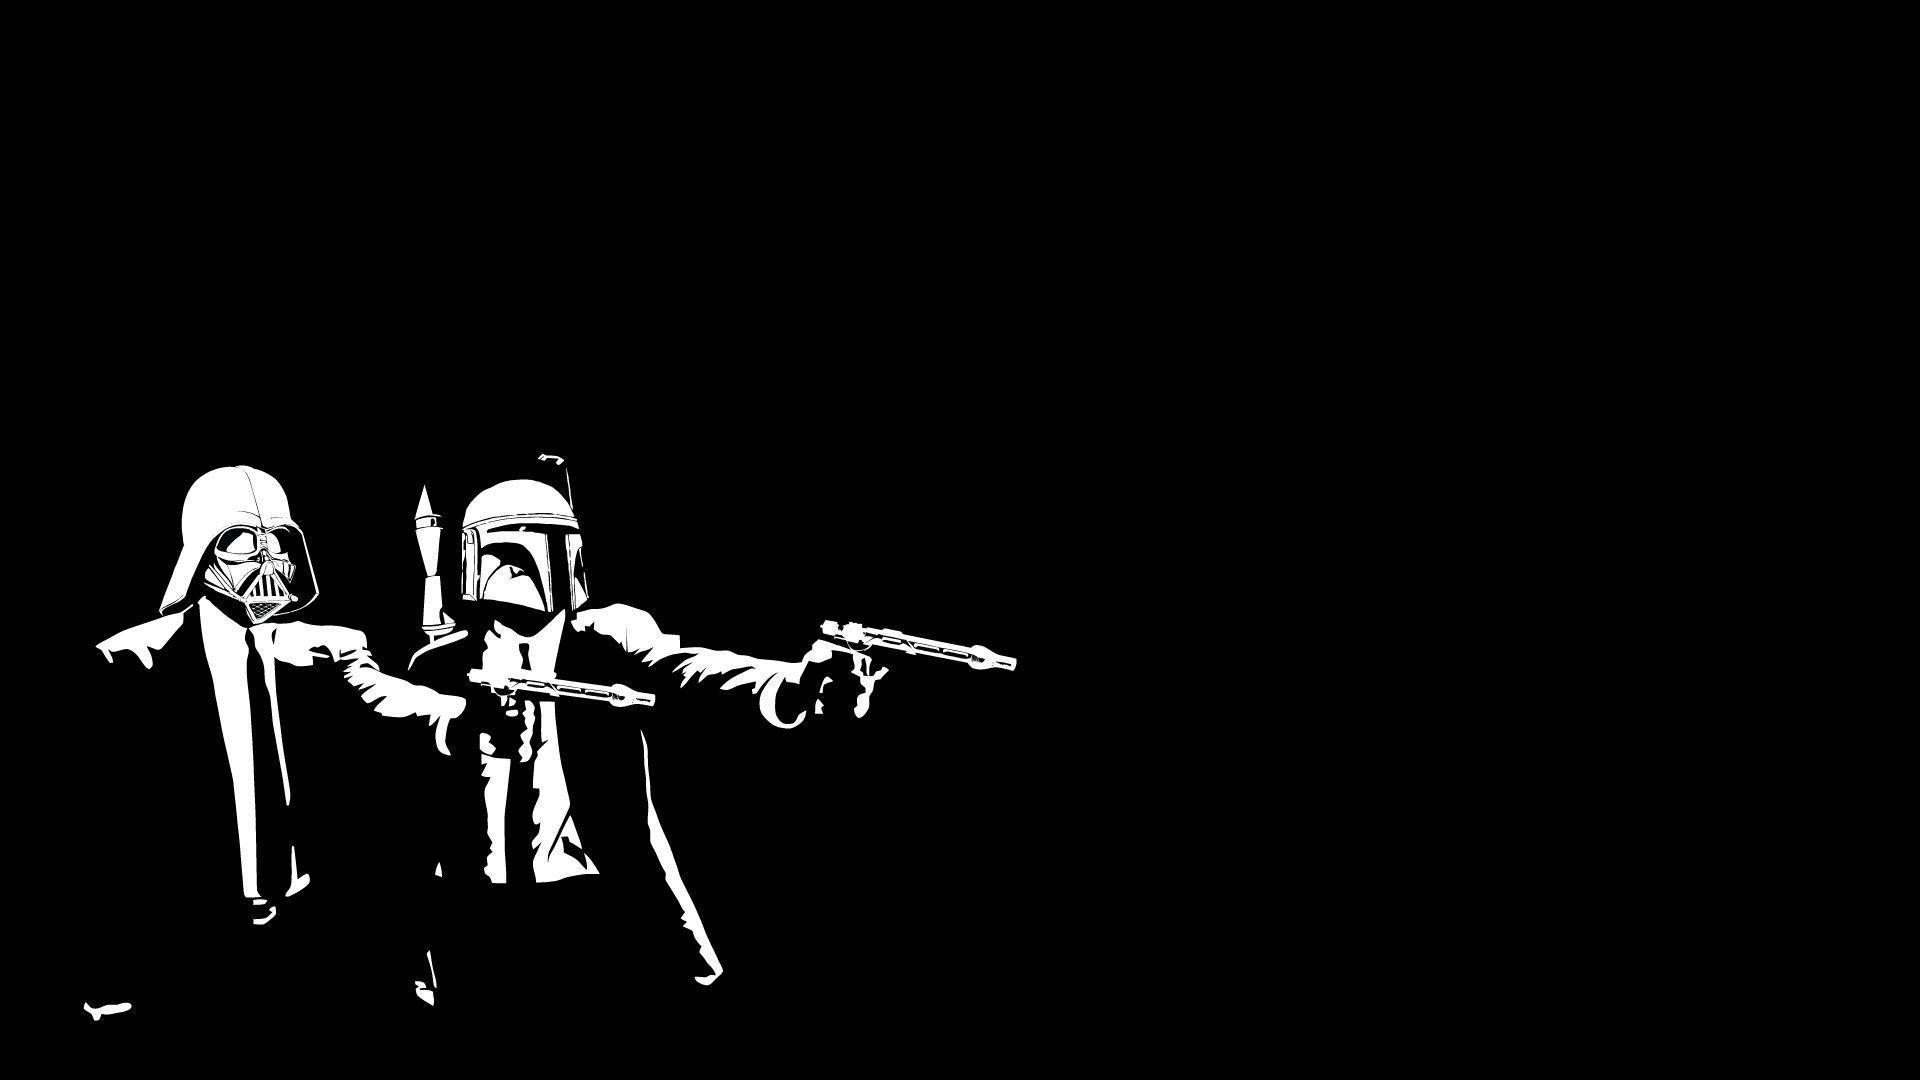 Star Wars Pulp Fiction Wallpaper